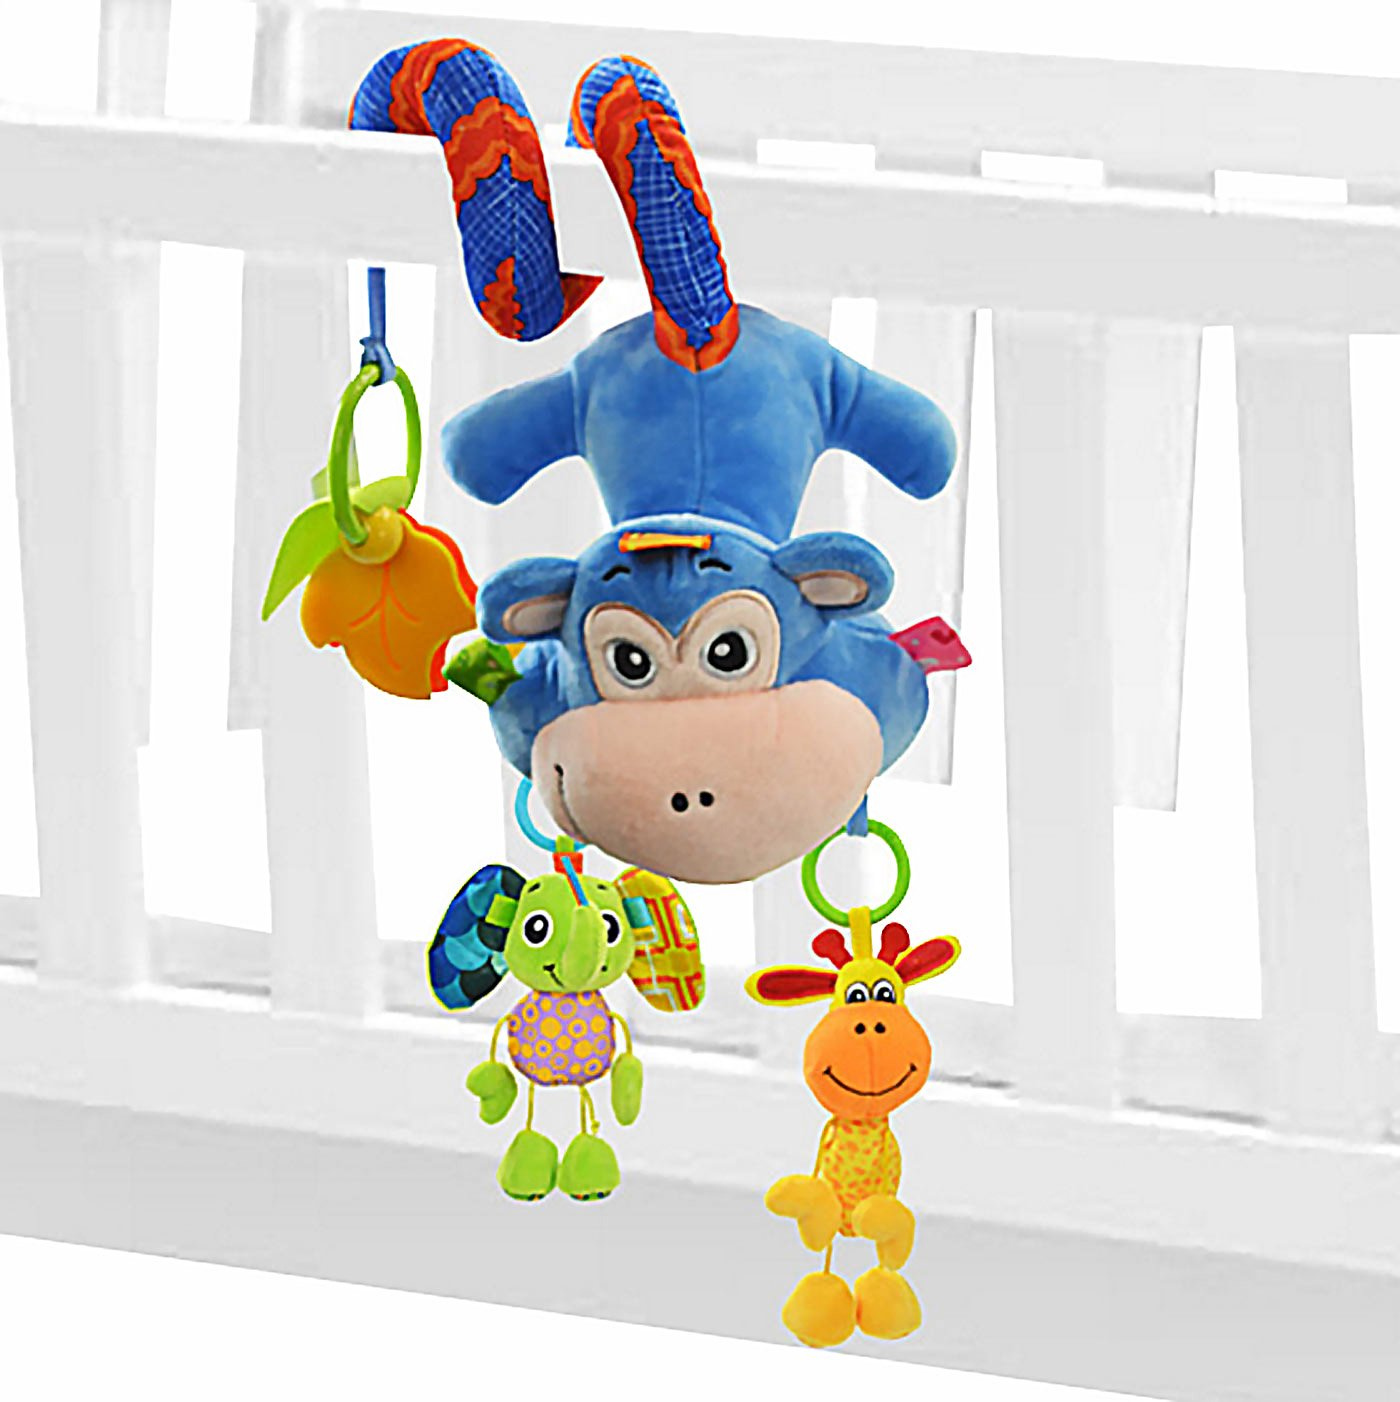 SOZZY Azul Juguetes Colgantes Espiral de Animales para Cuna Cochecito Carrito beb/és Recien nacidos Peluche con Mordedor Sonido para ni/ños ni/ñas arrastrar Mono